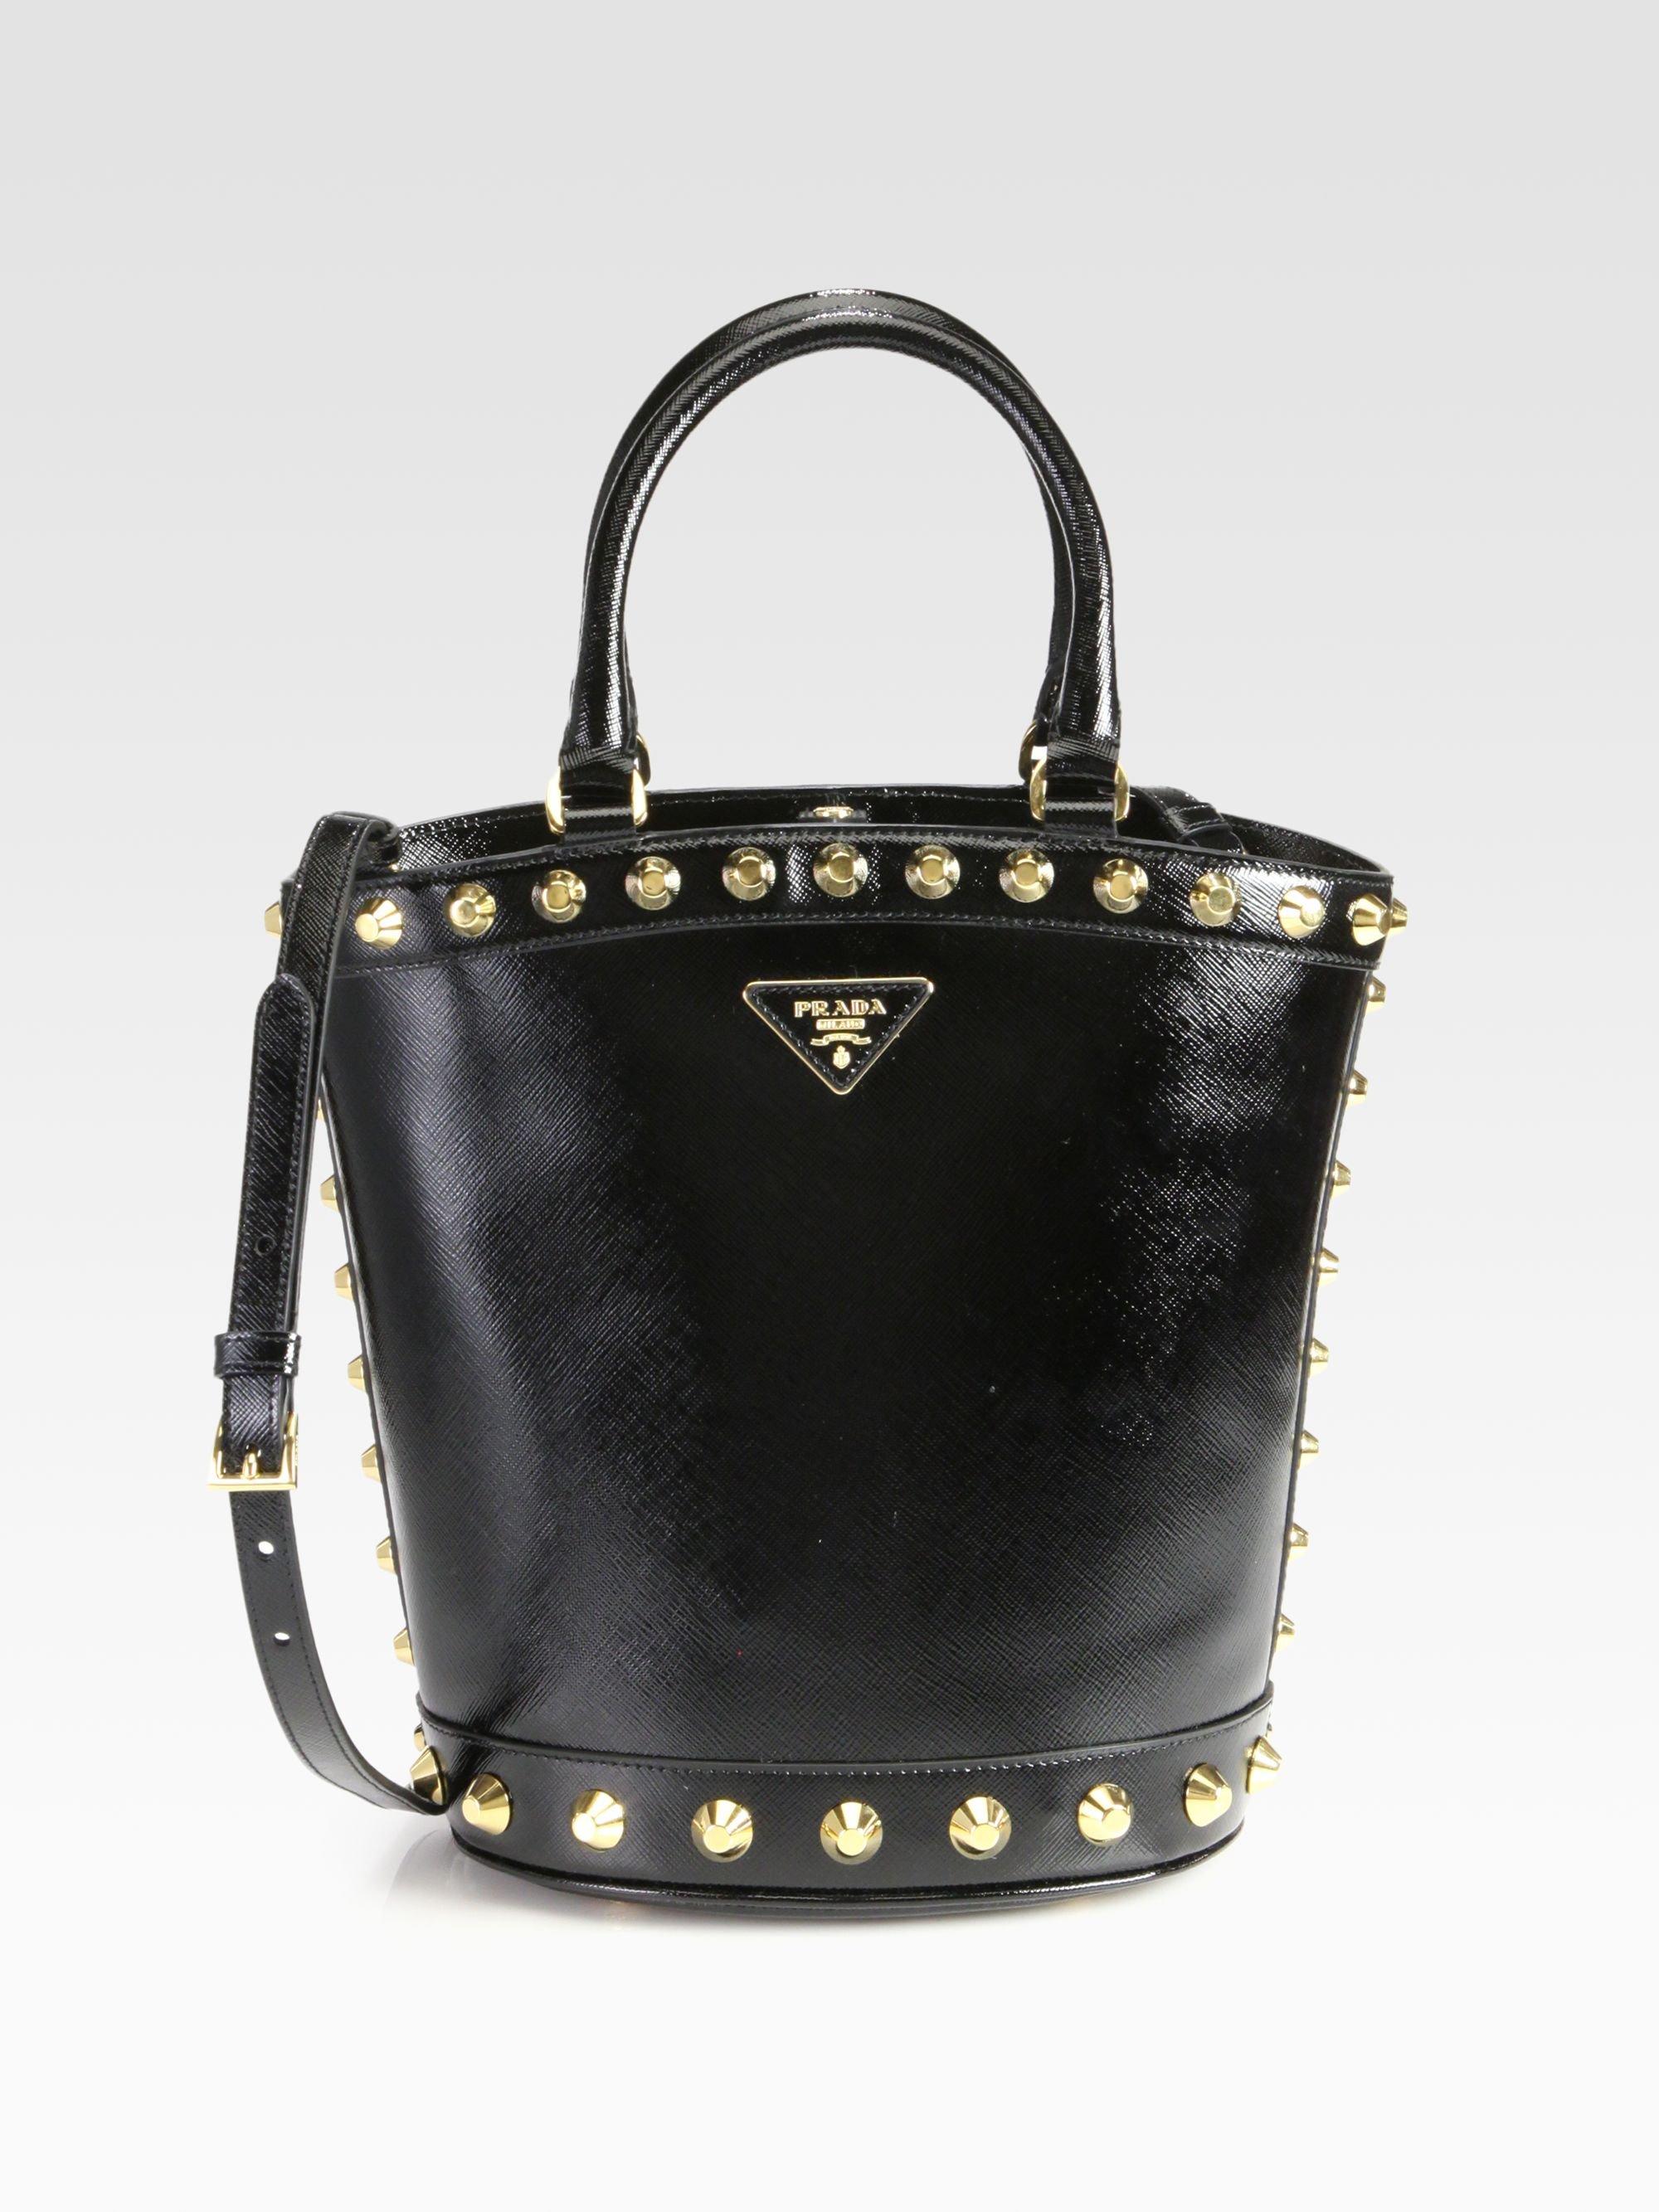 Prada Saffiano Vernice Studded Bucket Bag in Black   Lyst